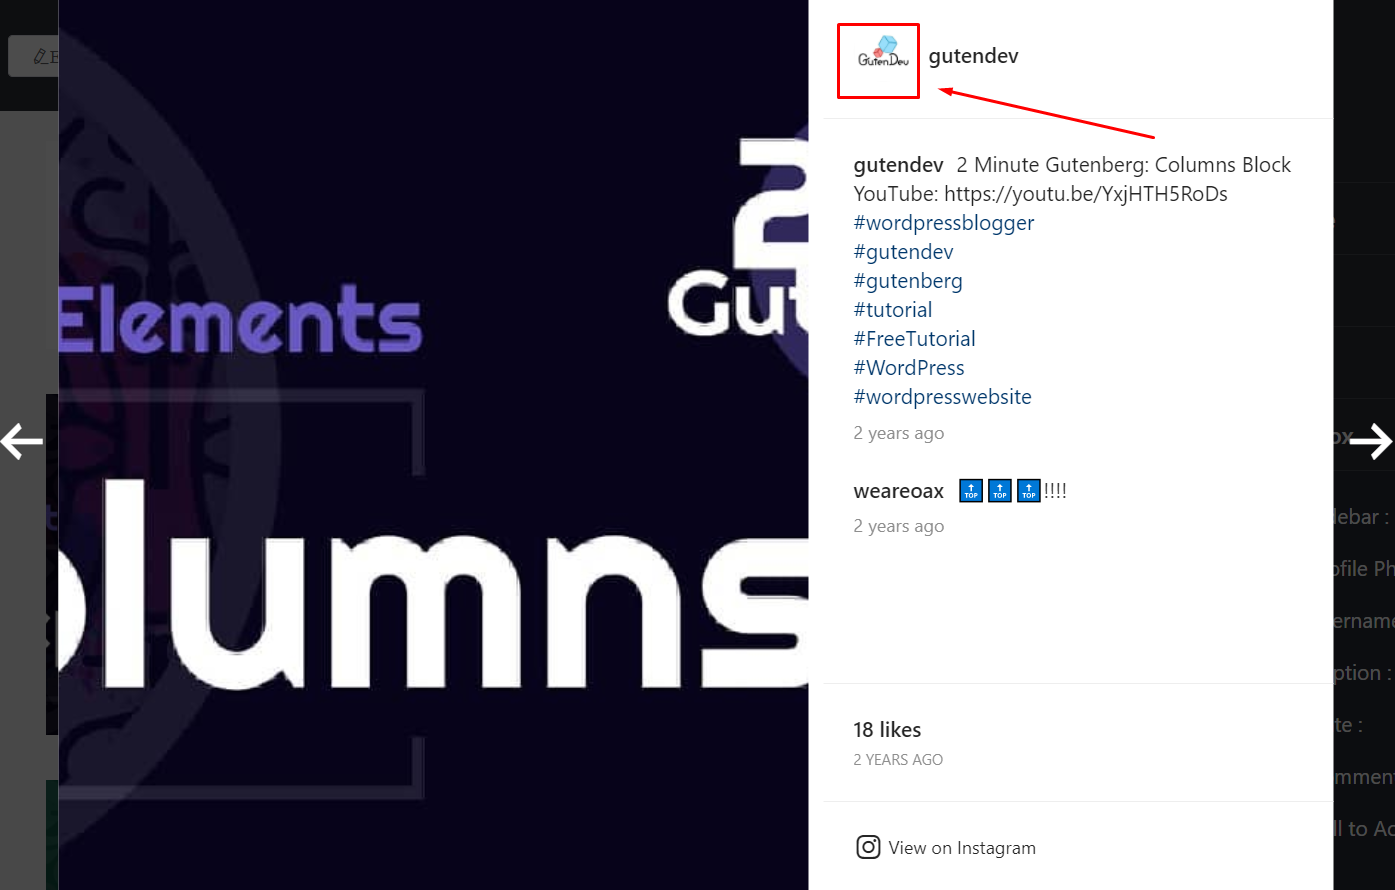 Instagram settings display profile photo